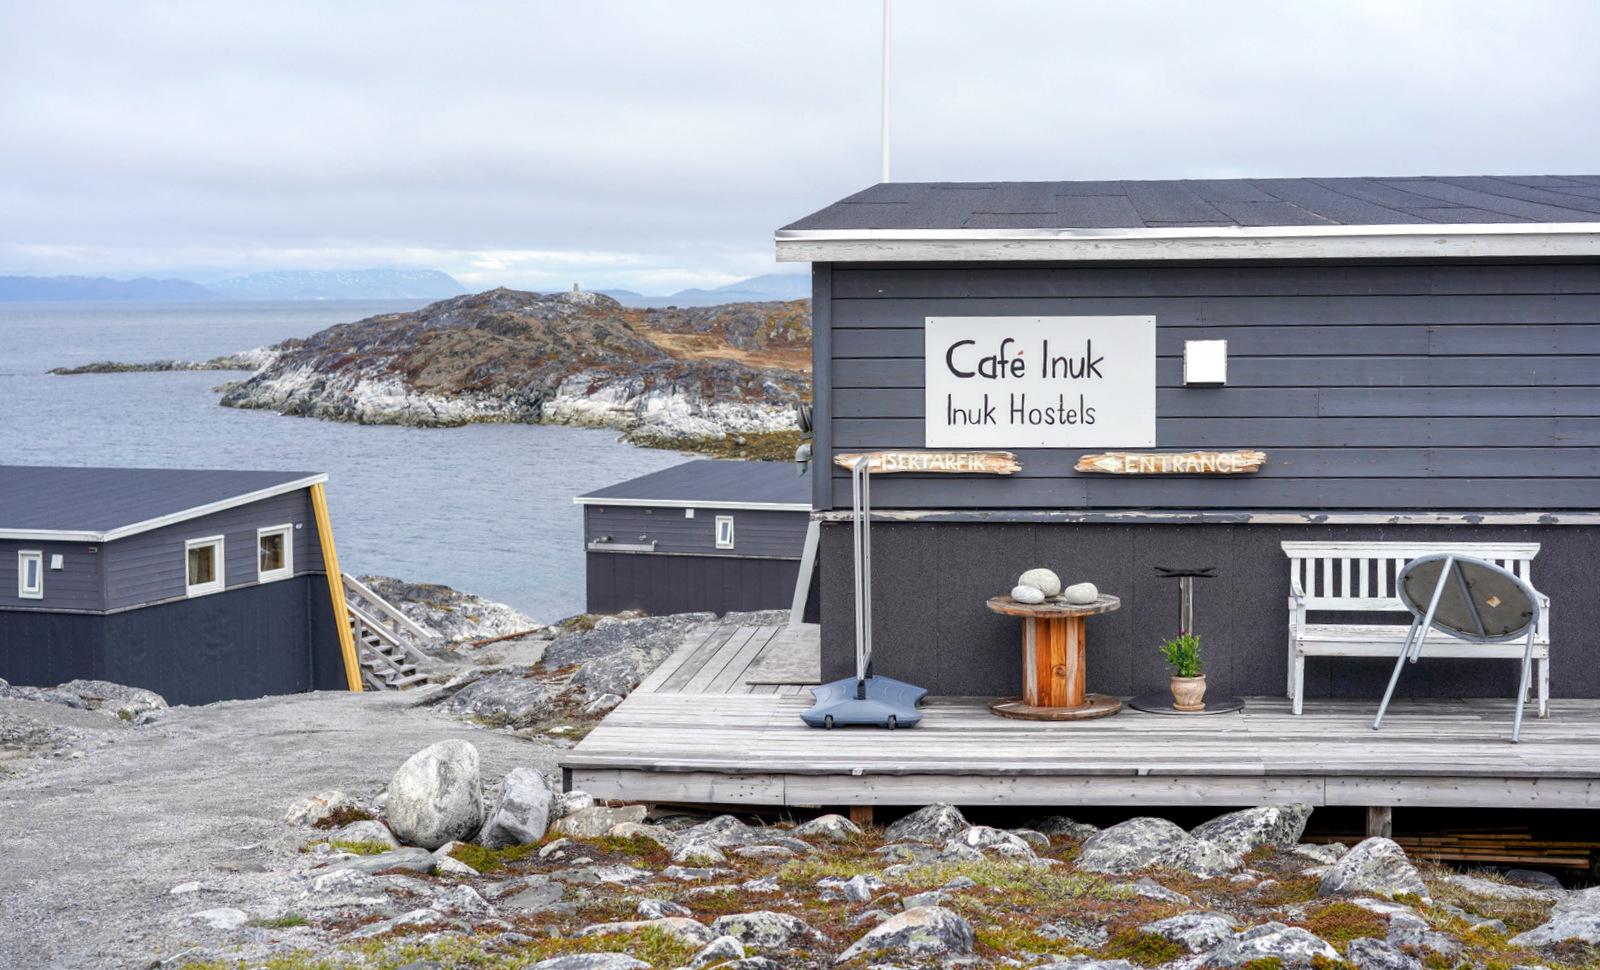 Cafe Inuk, Greenland